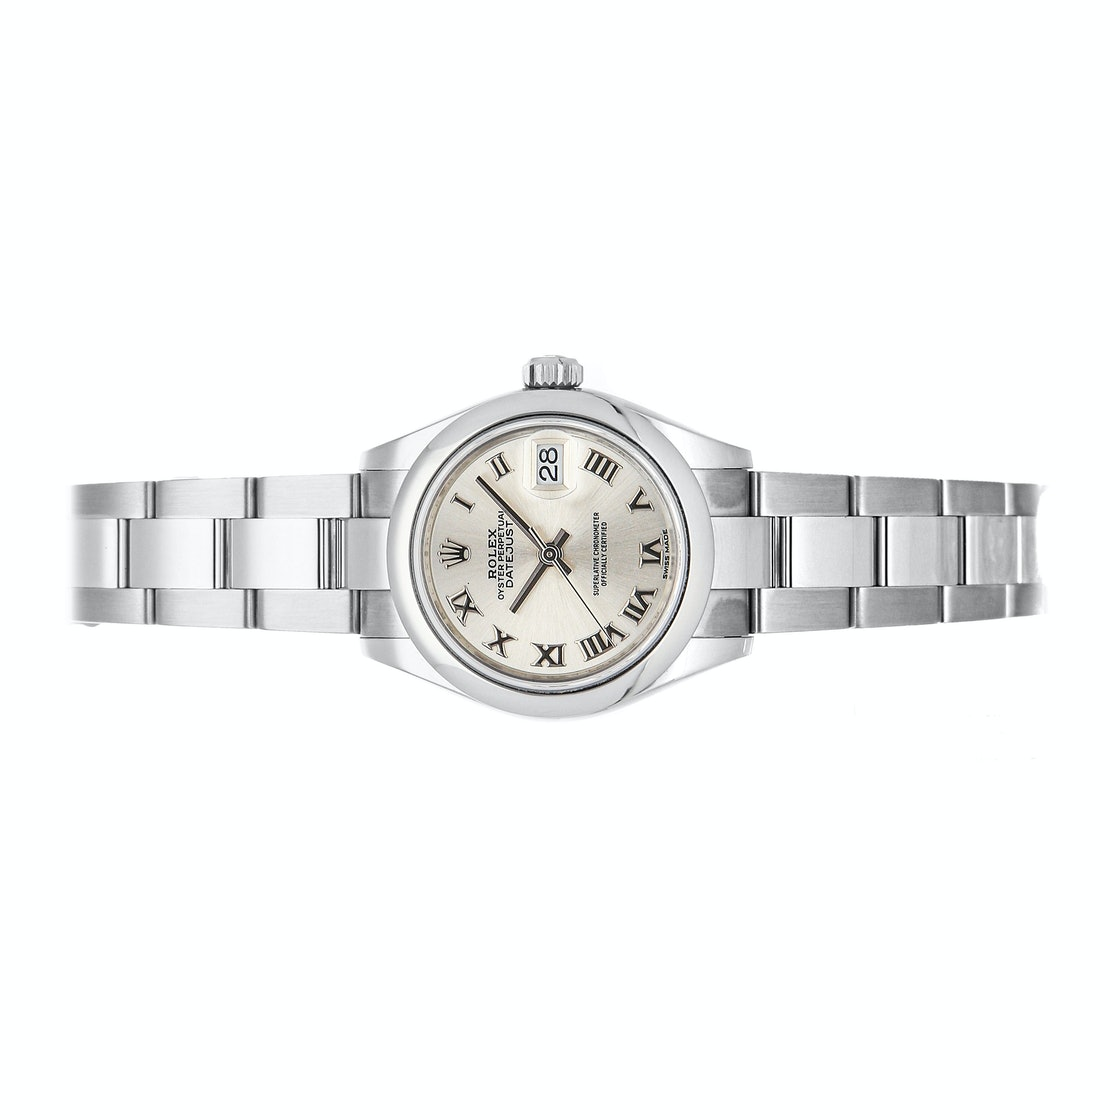 Rolex Datejust 279160